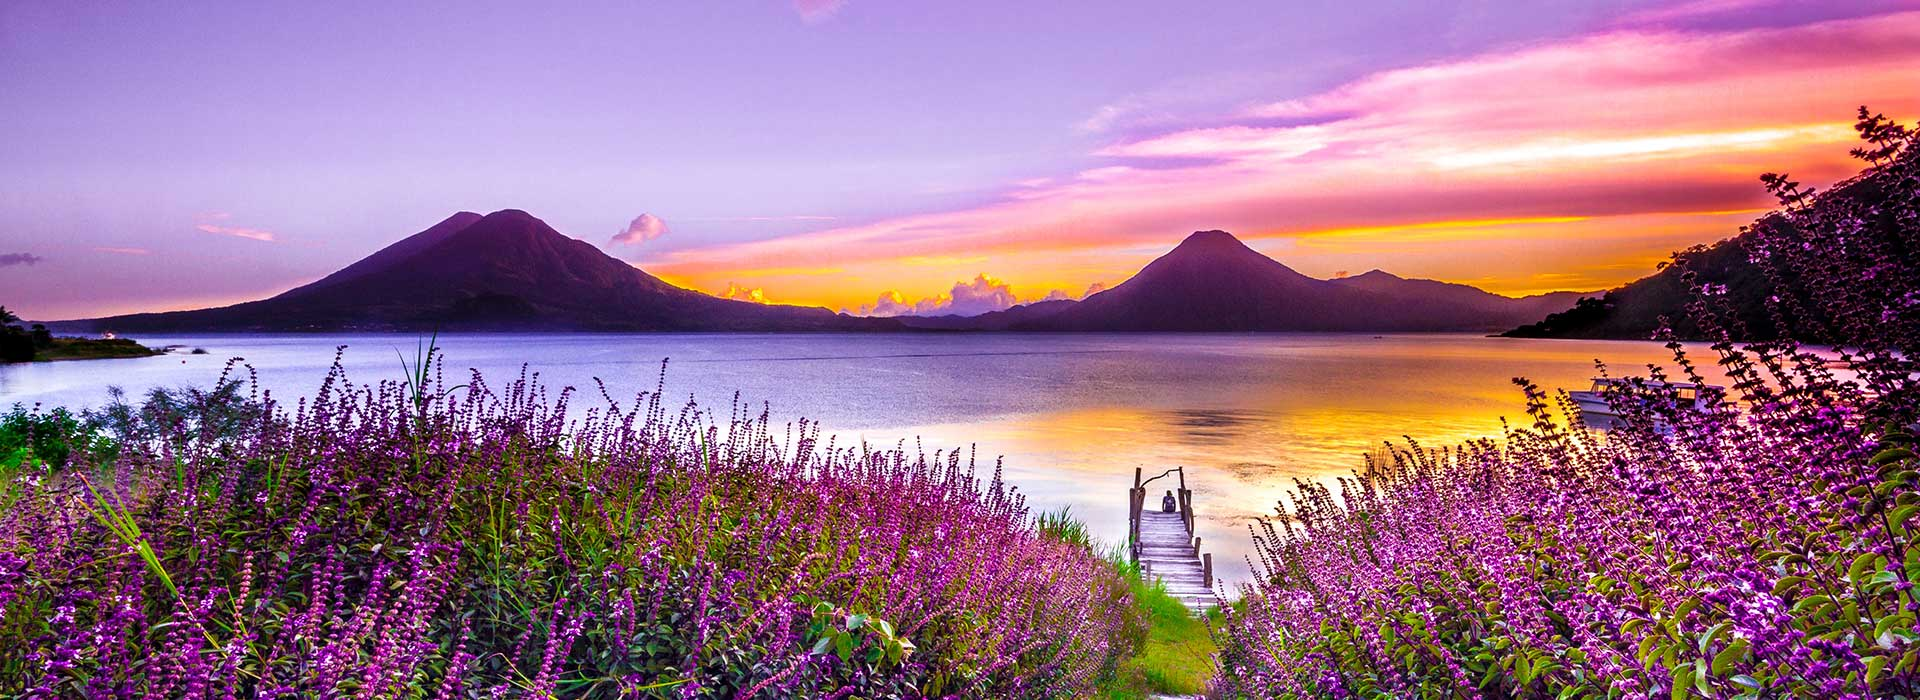 Trips to Guatemala